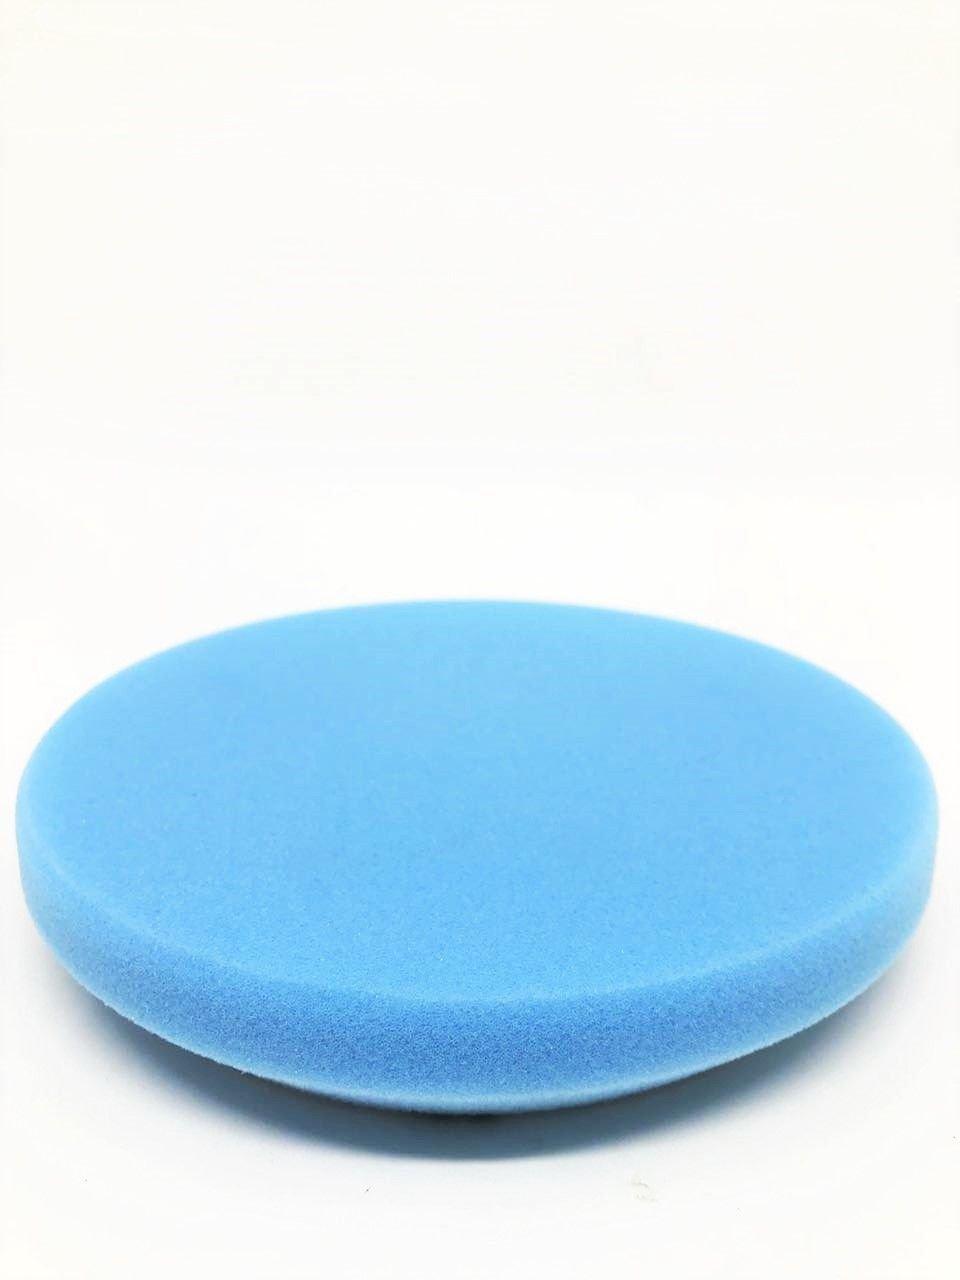 Lincoln Boina de Espuma Azul Pré Lustro  3,5